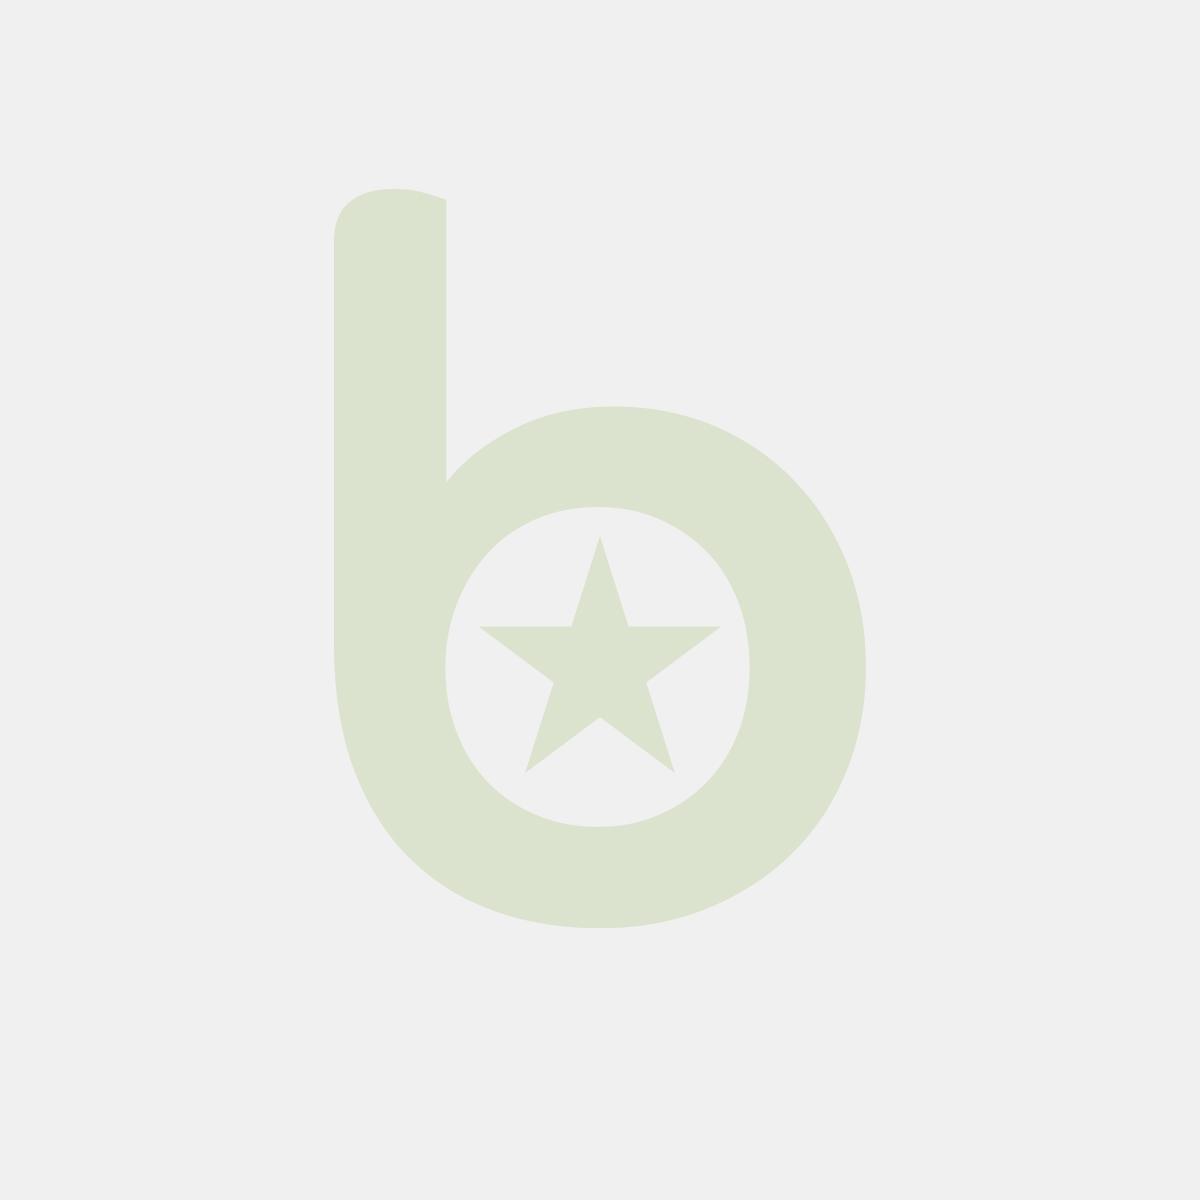 Ramka do tacek MANUPACK 227x178/3 trójdzielna DUNI/ANIS/MCS